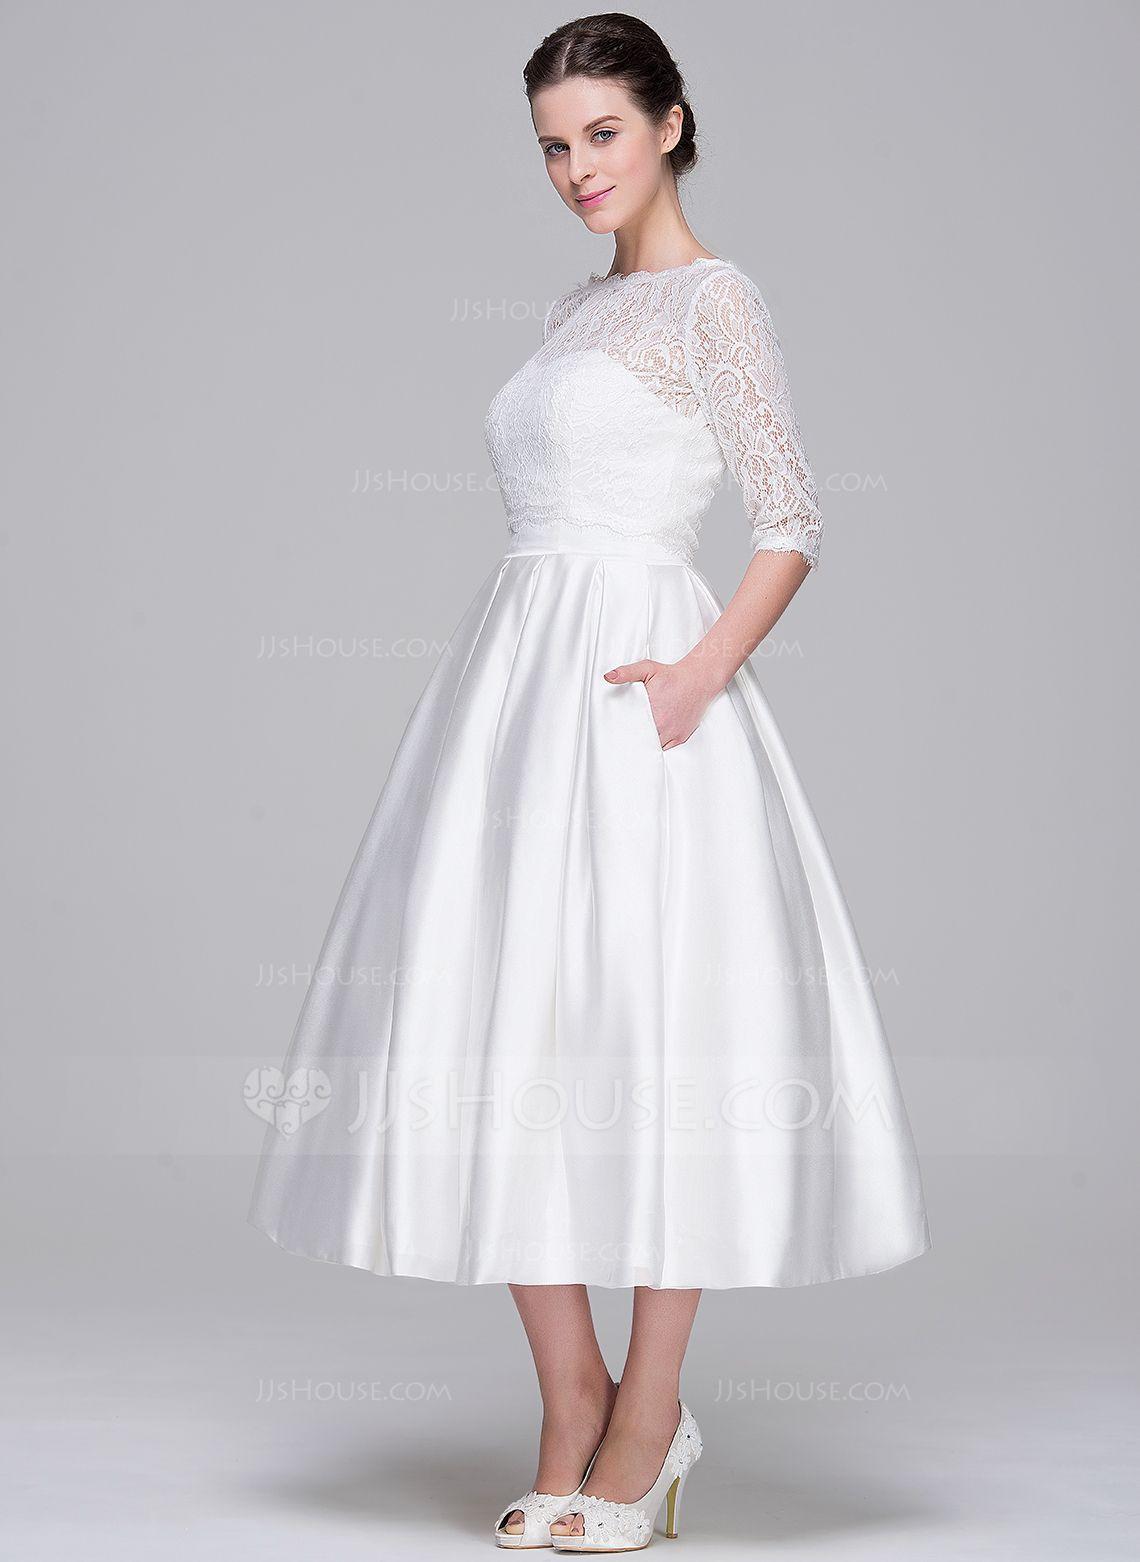 Wedding dress wrap  HalfSleeve Lace Wedding Wrap   Lace Receptions and Wedding